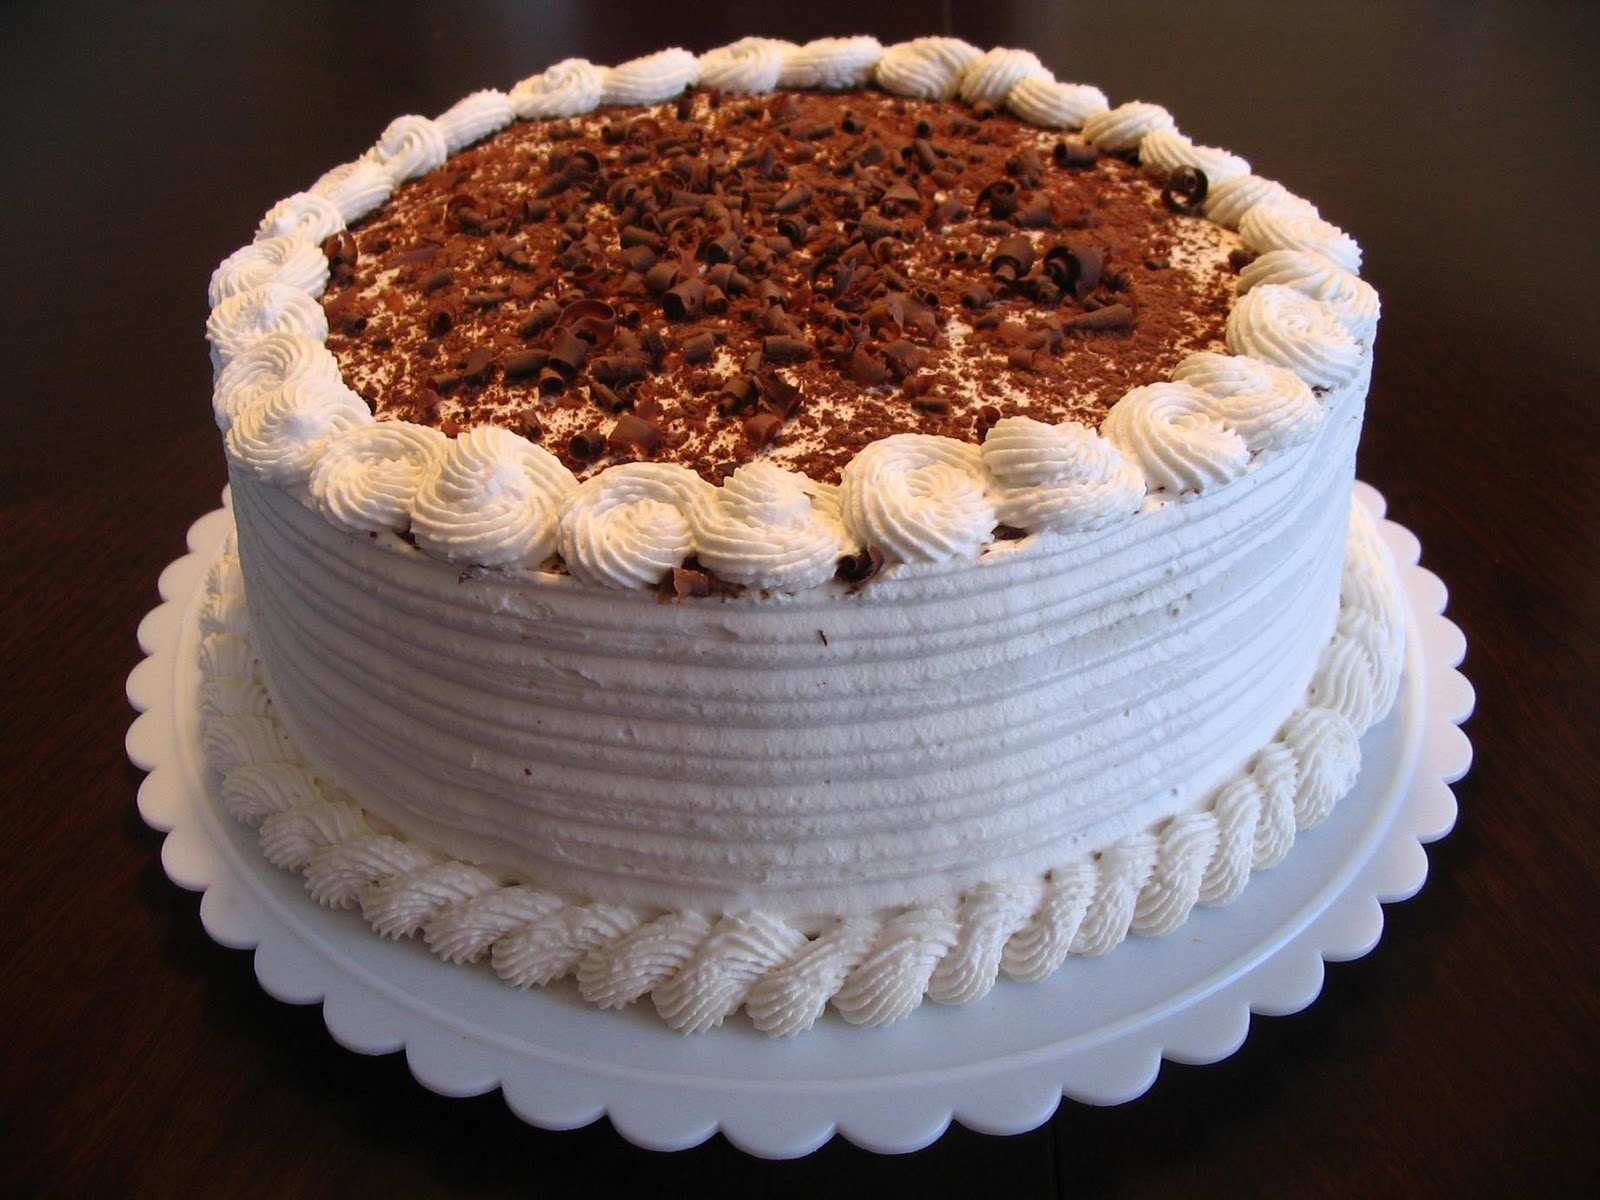 Resep Cake Tiramisu Jtt: Aneka Pastry Dan Birthday Cake Party